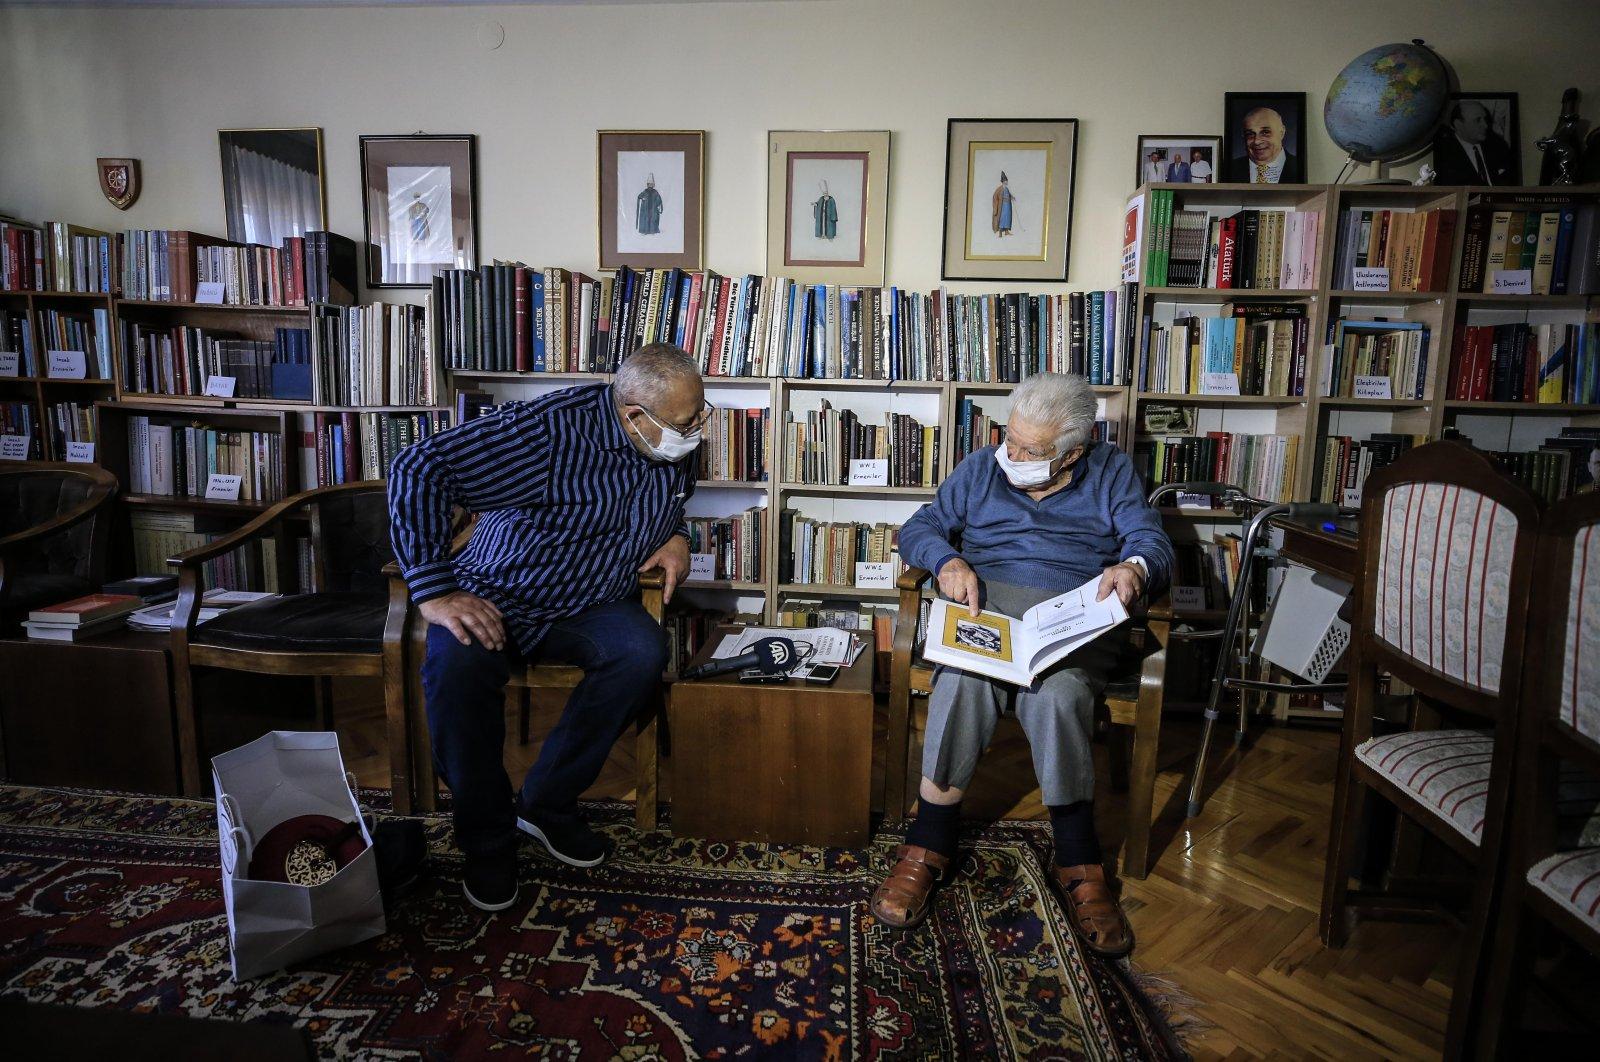 Mehmet Arif Demirer (R) shows a photo to Ahmet Kemal Atala, in the capital Ankara, Turkey, Oct. 25, 2020. (AA Photo)